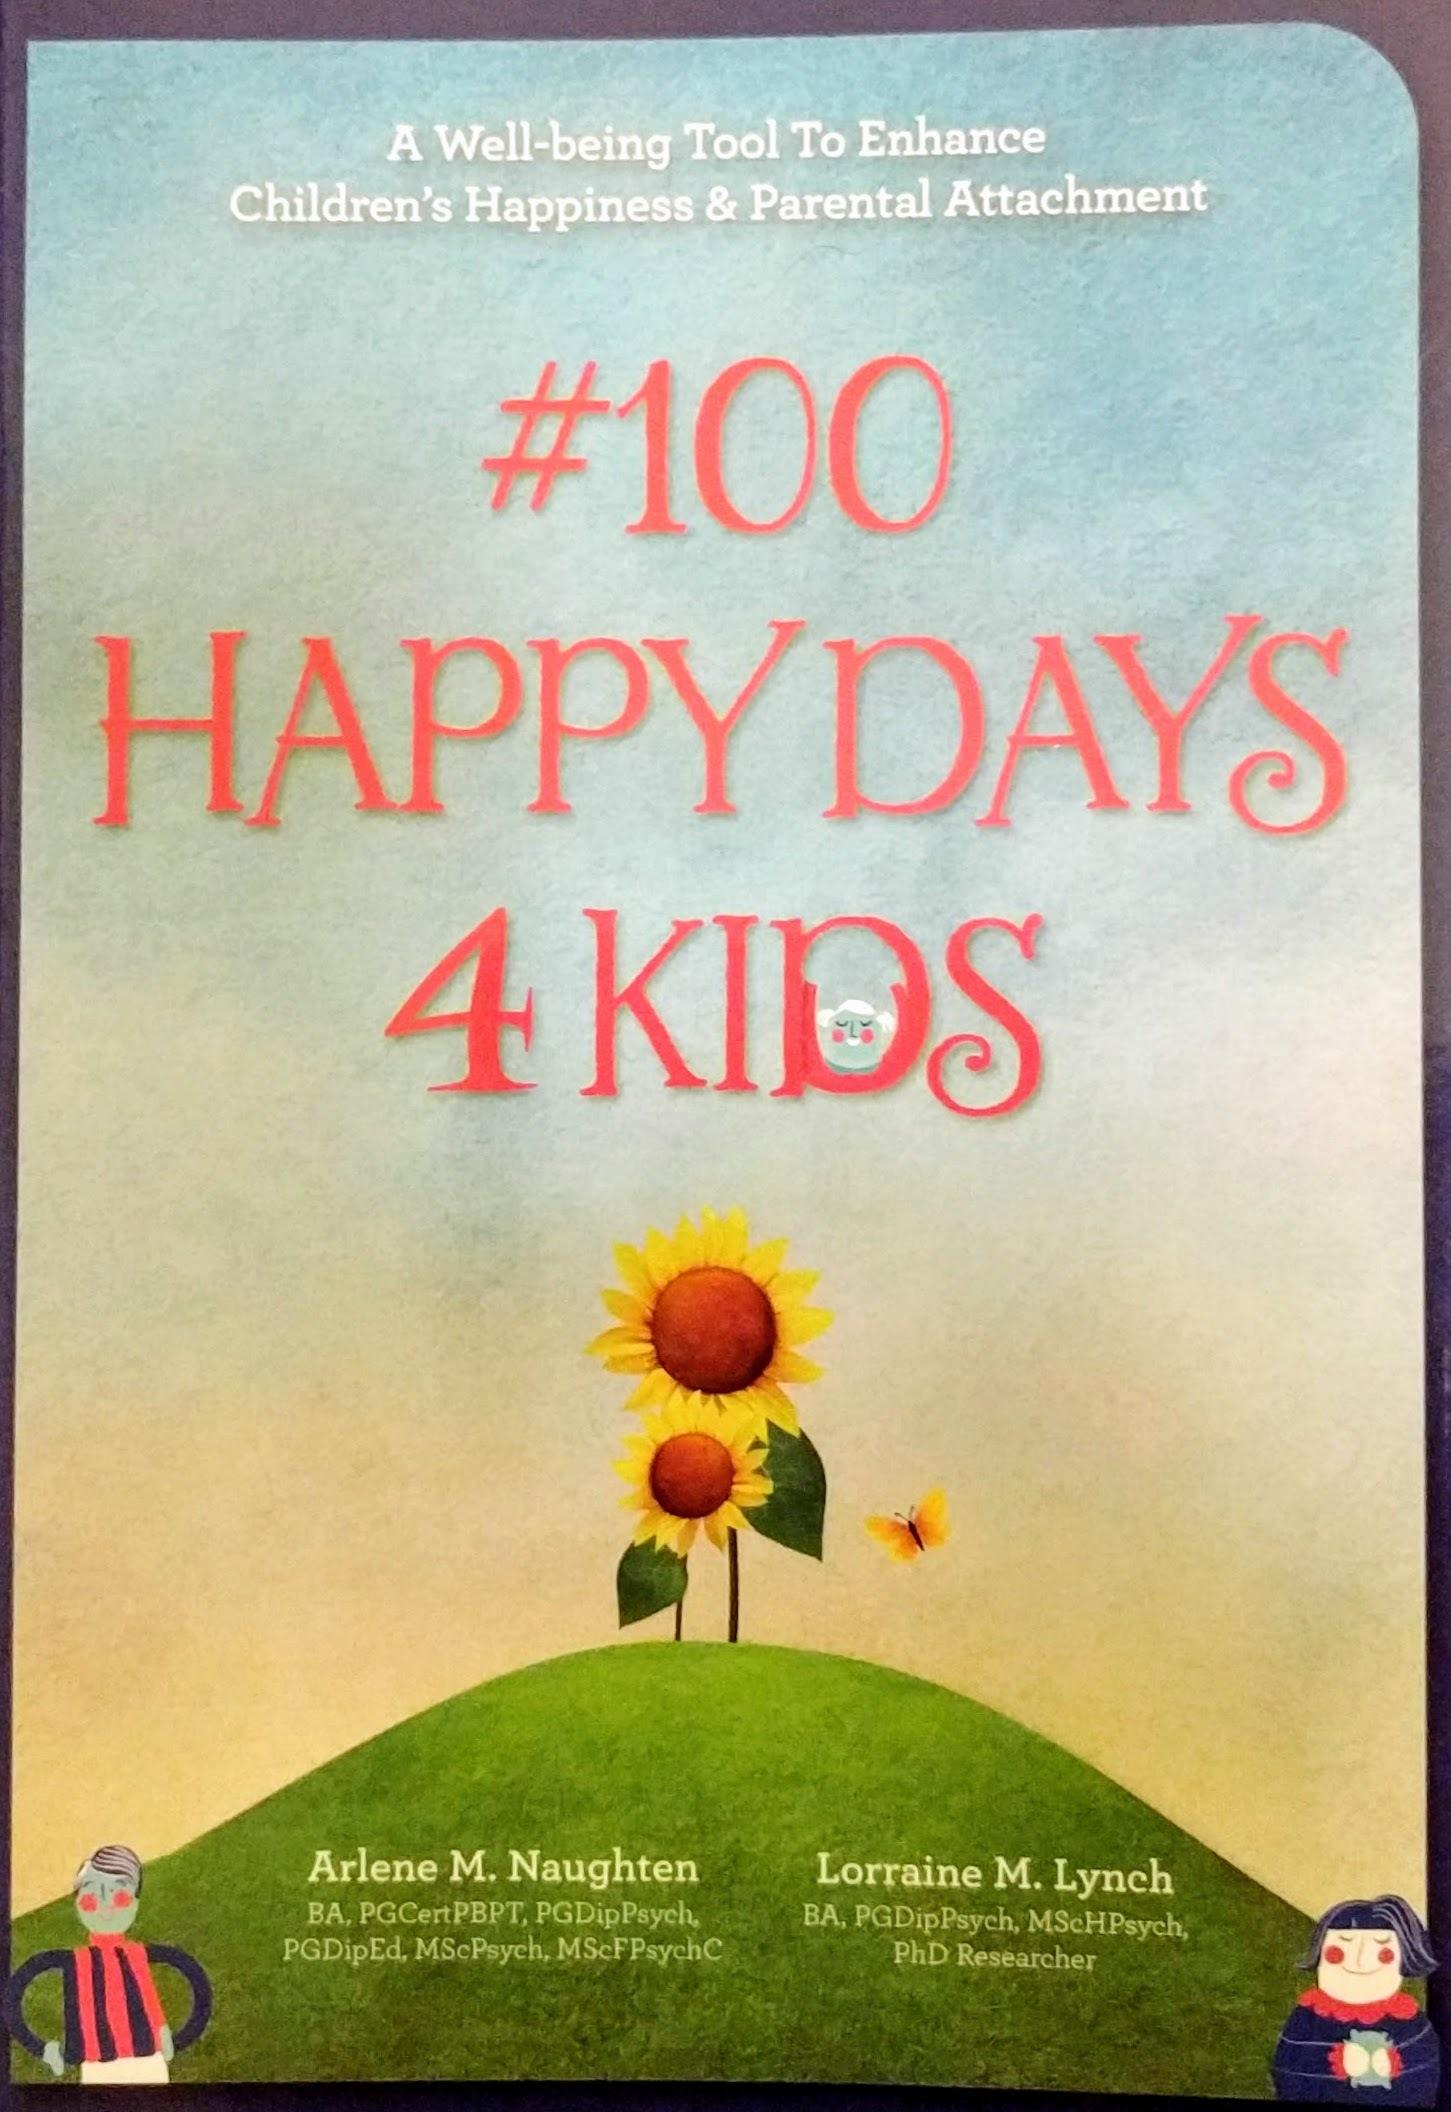 #100 happy days for kids